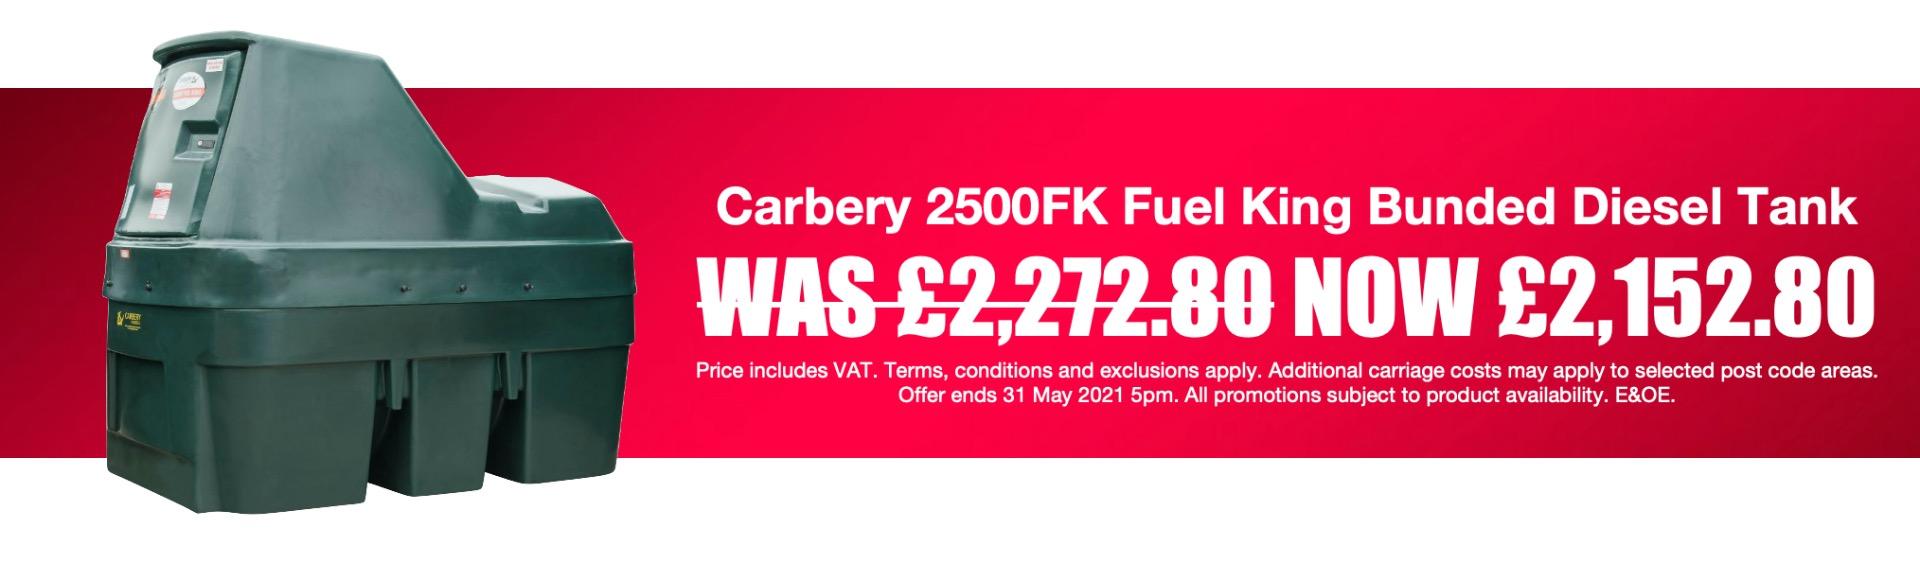 Carbery 2500FK Fuel King Bunded Diesel Tank Spring 2021 Promotion